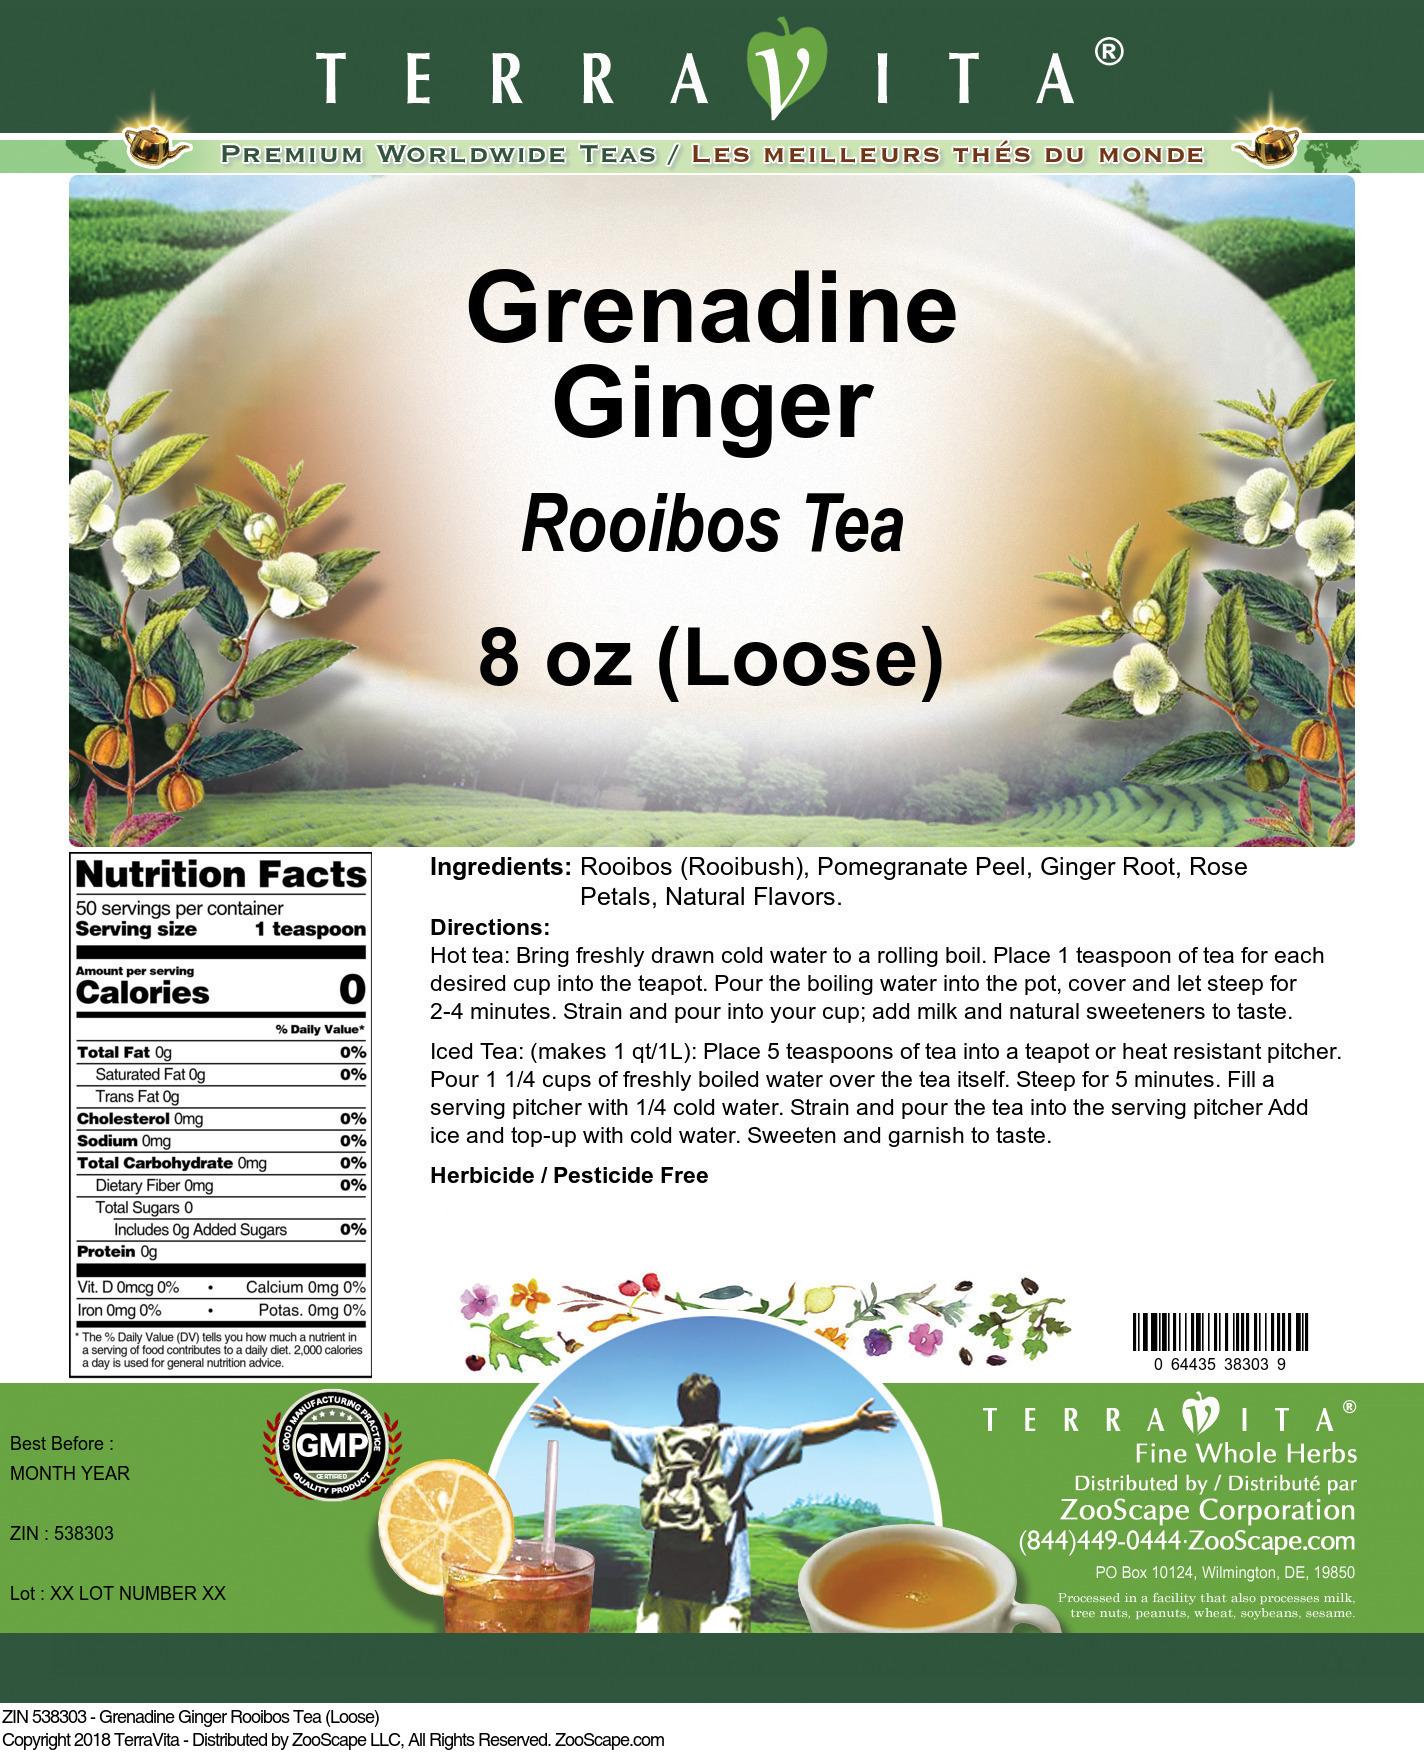 Grenadine Ginger Rooibos Tea